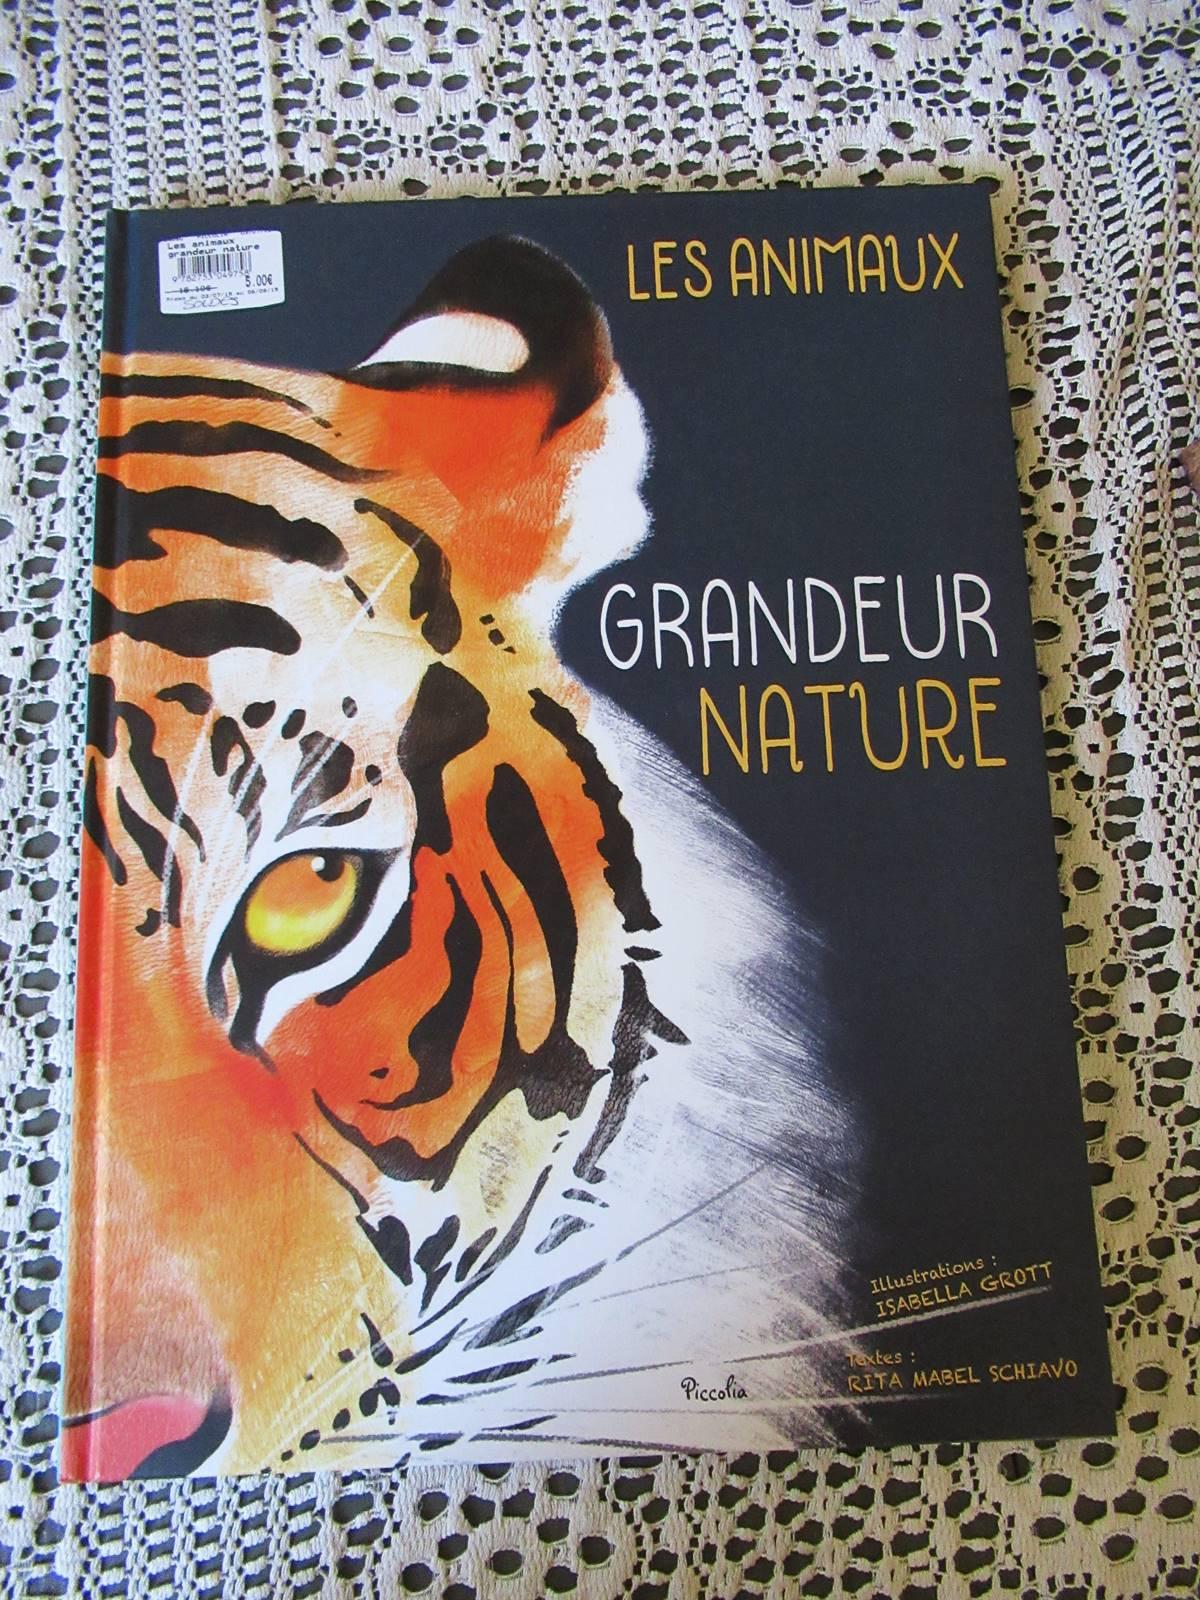 Les animaux grandeur nature